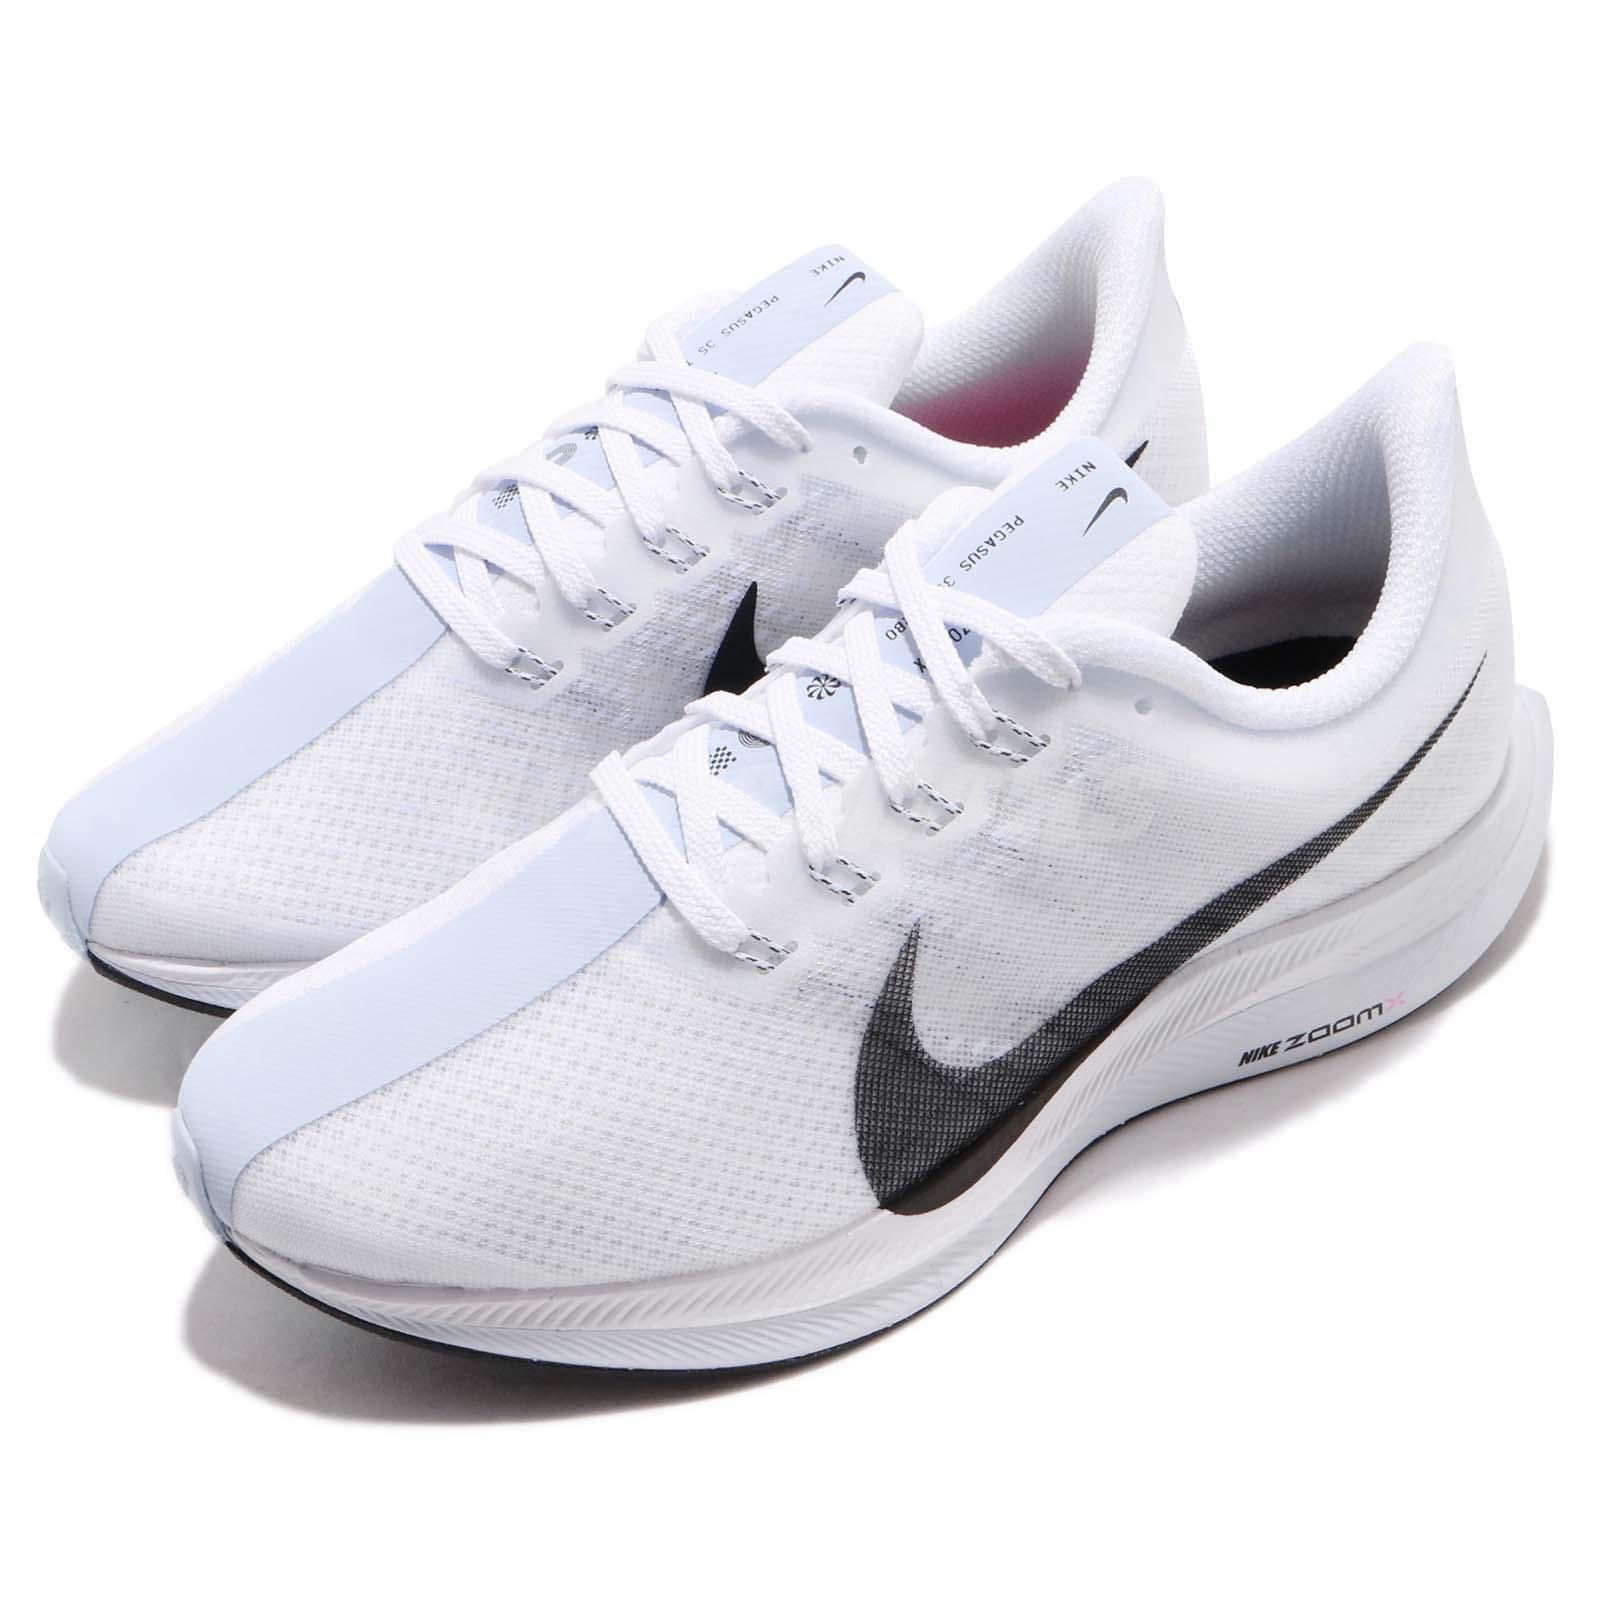 6205d13691418 Details about Nike Wmns Zoom Pegasus 35 Turbo White Black Blue Women  Running Shoes AJ4115-102